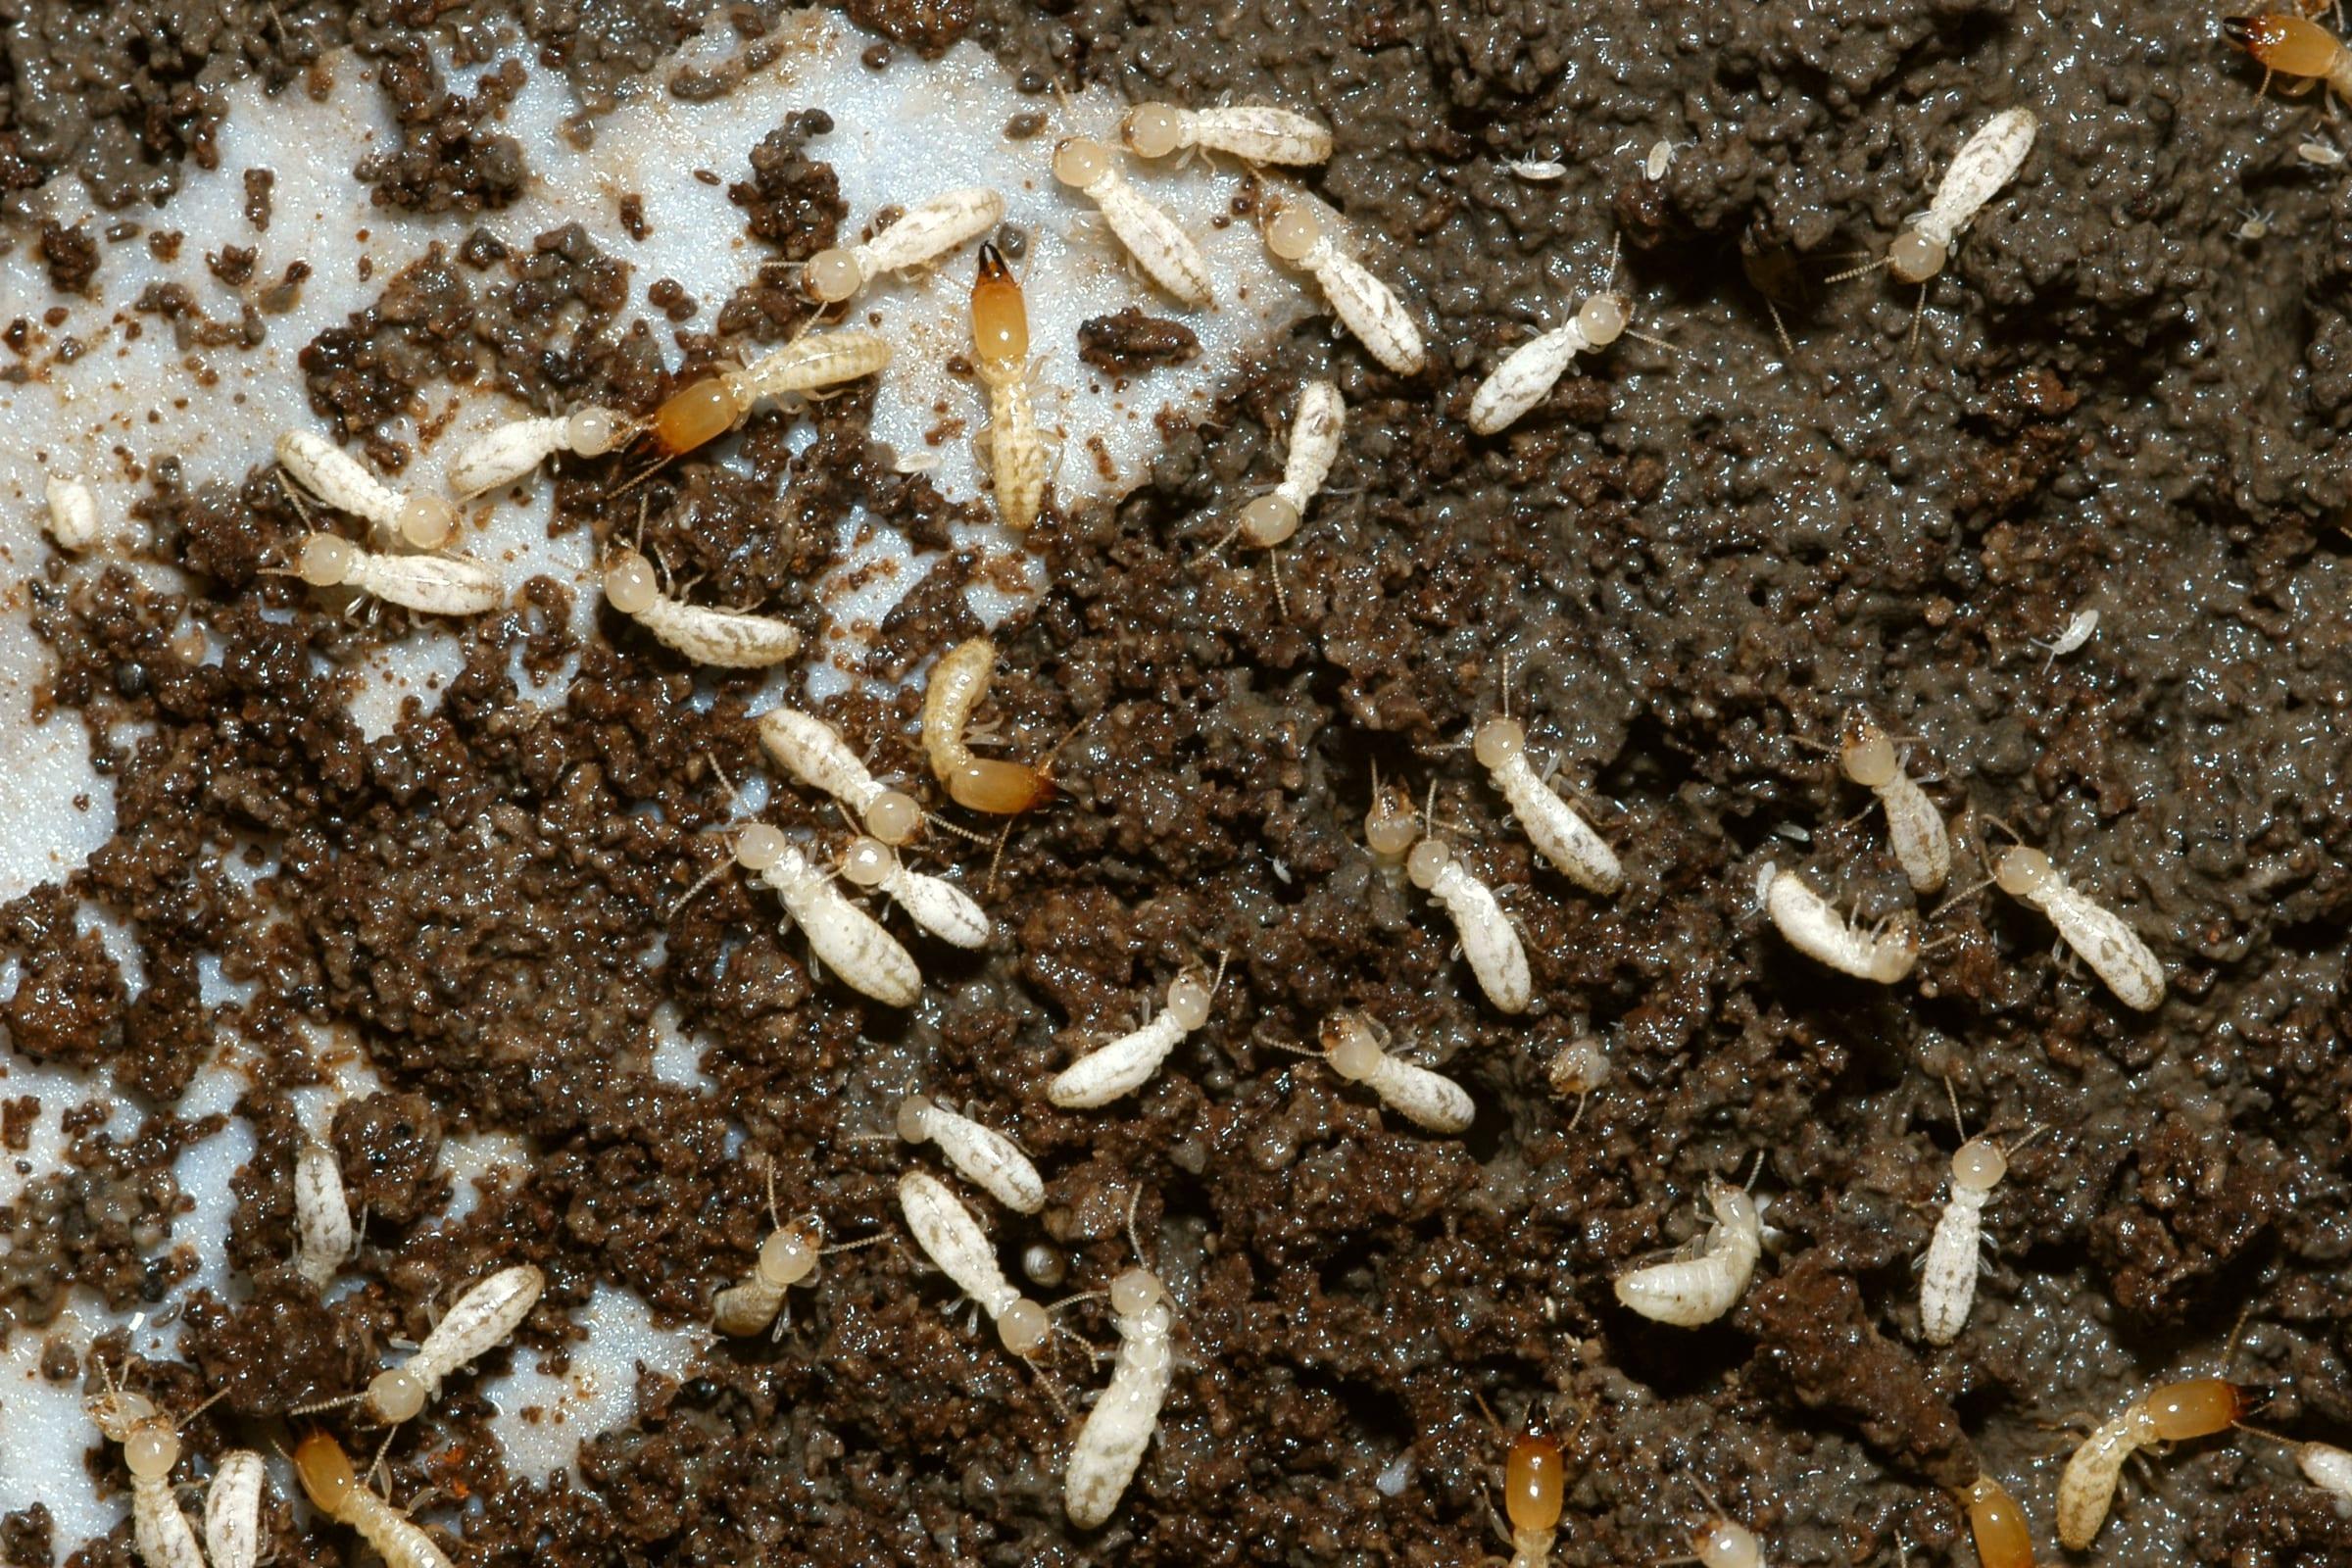 Termites - Subterranean